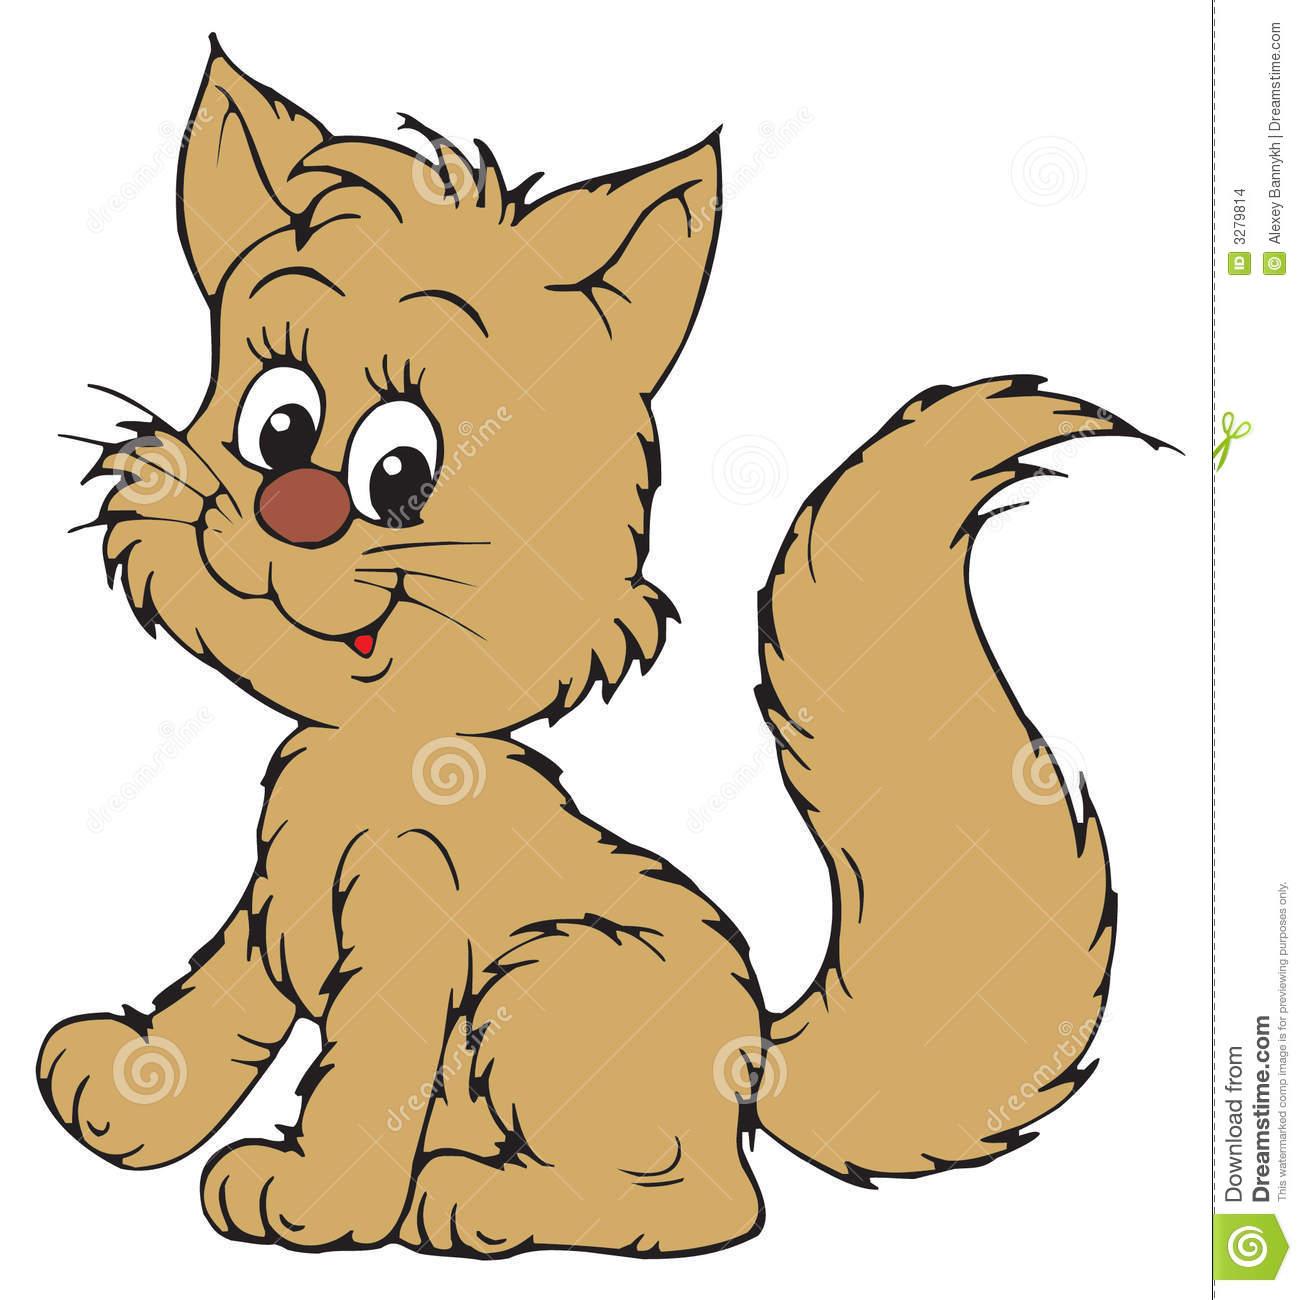 Kitten clipart #6, Download drawings